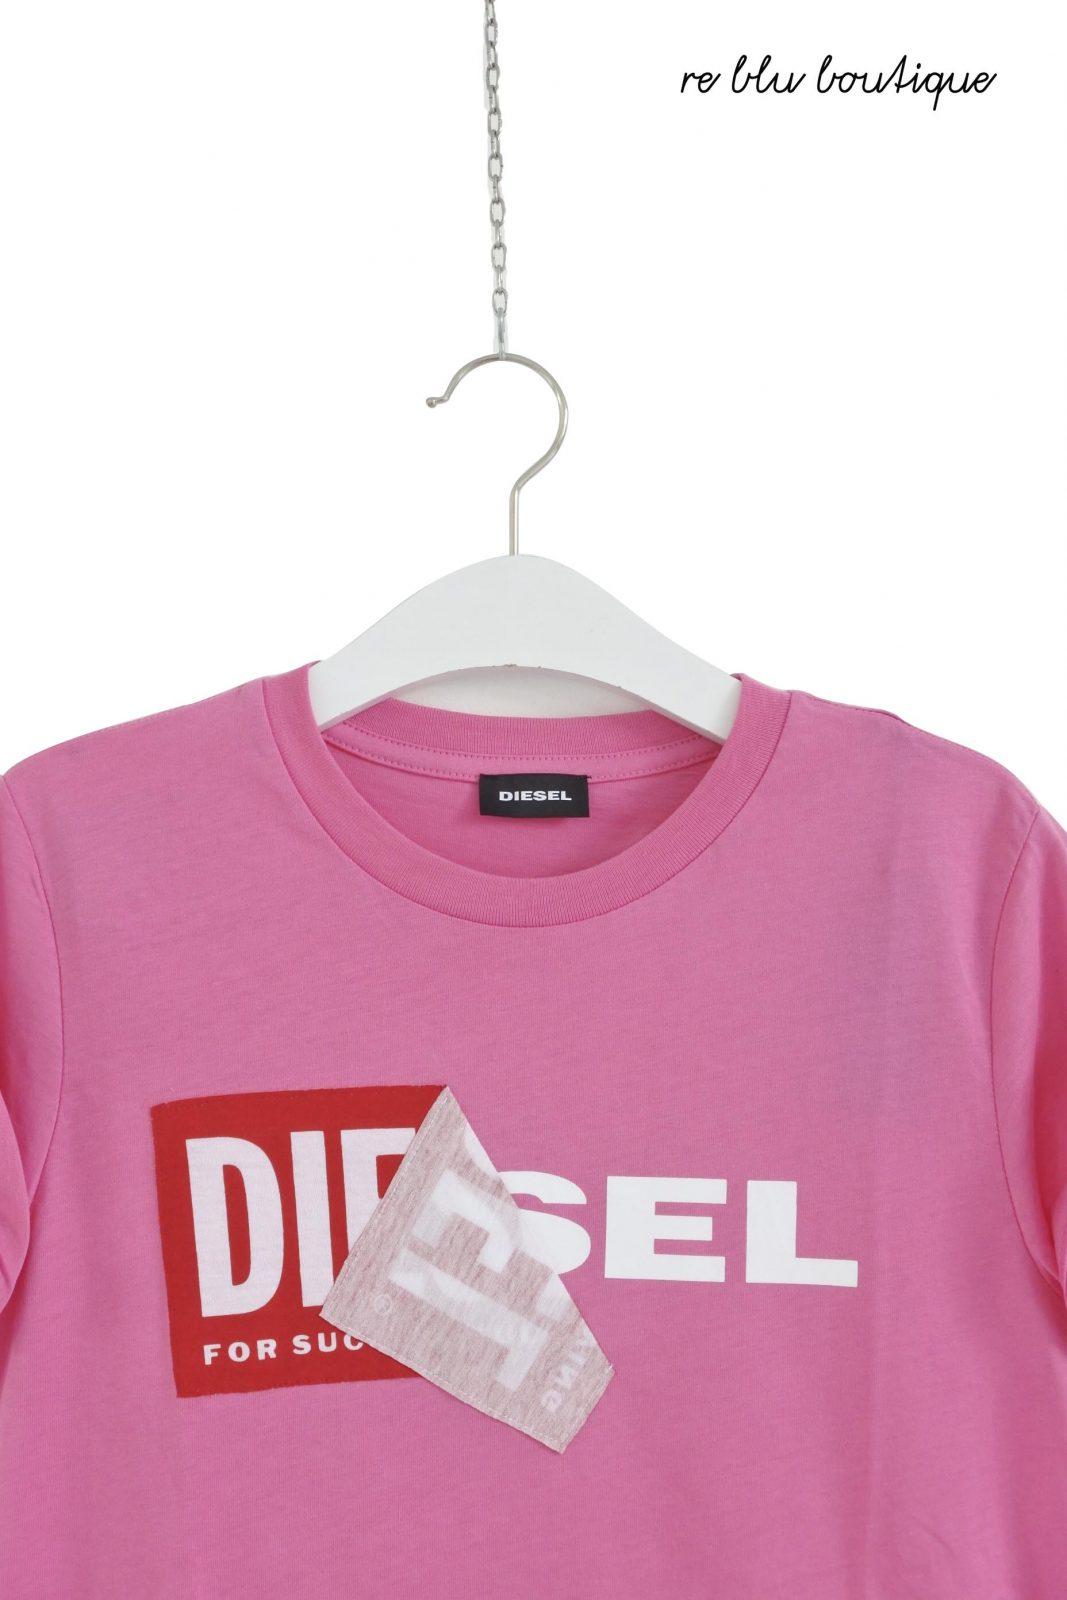 4f9ac4c6f89 T-Shirt Rosa Logo Strappato Diesel - Re Blu